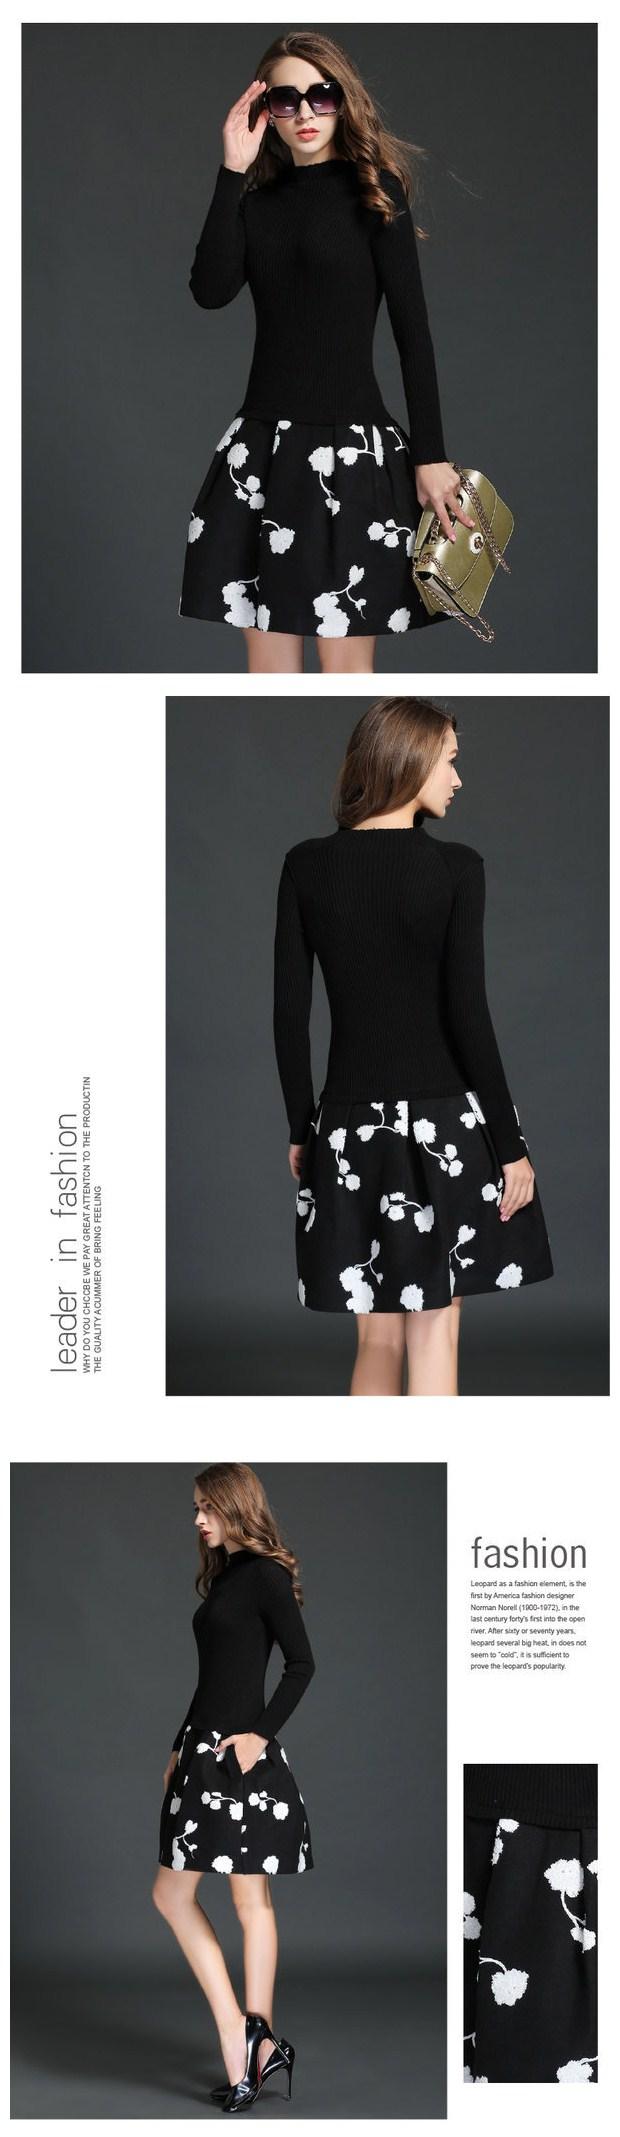 Elegant fashion korean women long sleeve ball gown embroidery floral